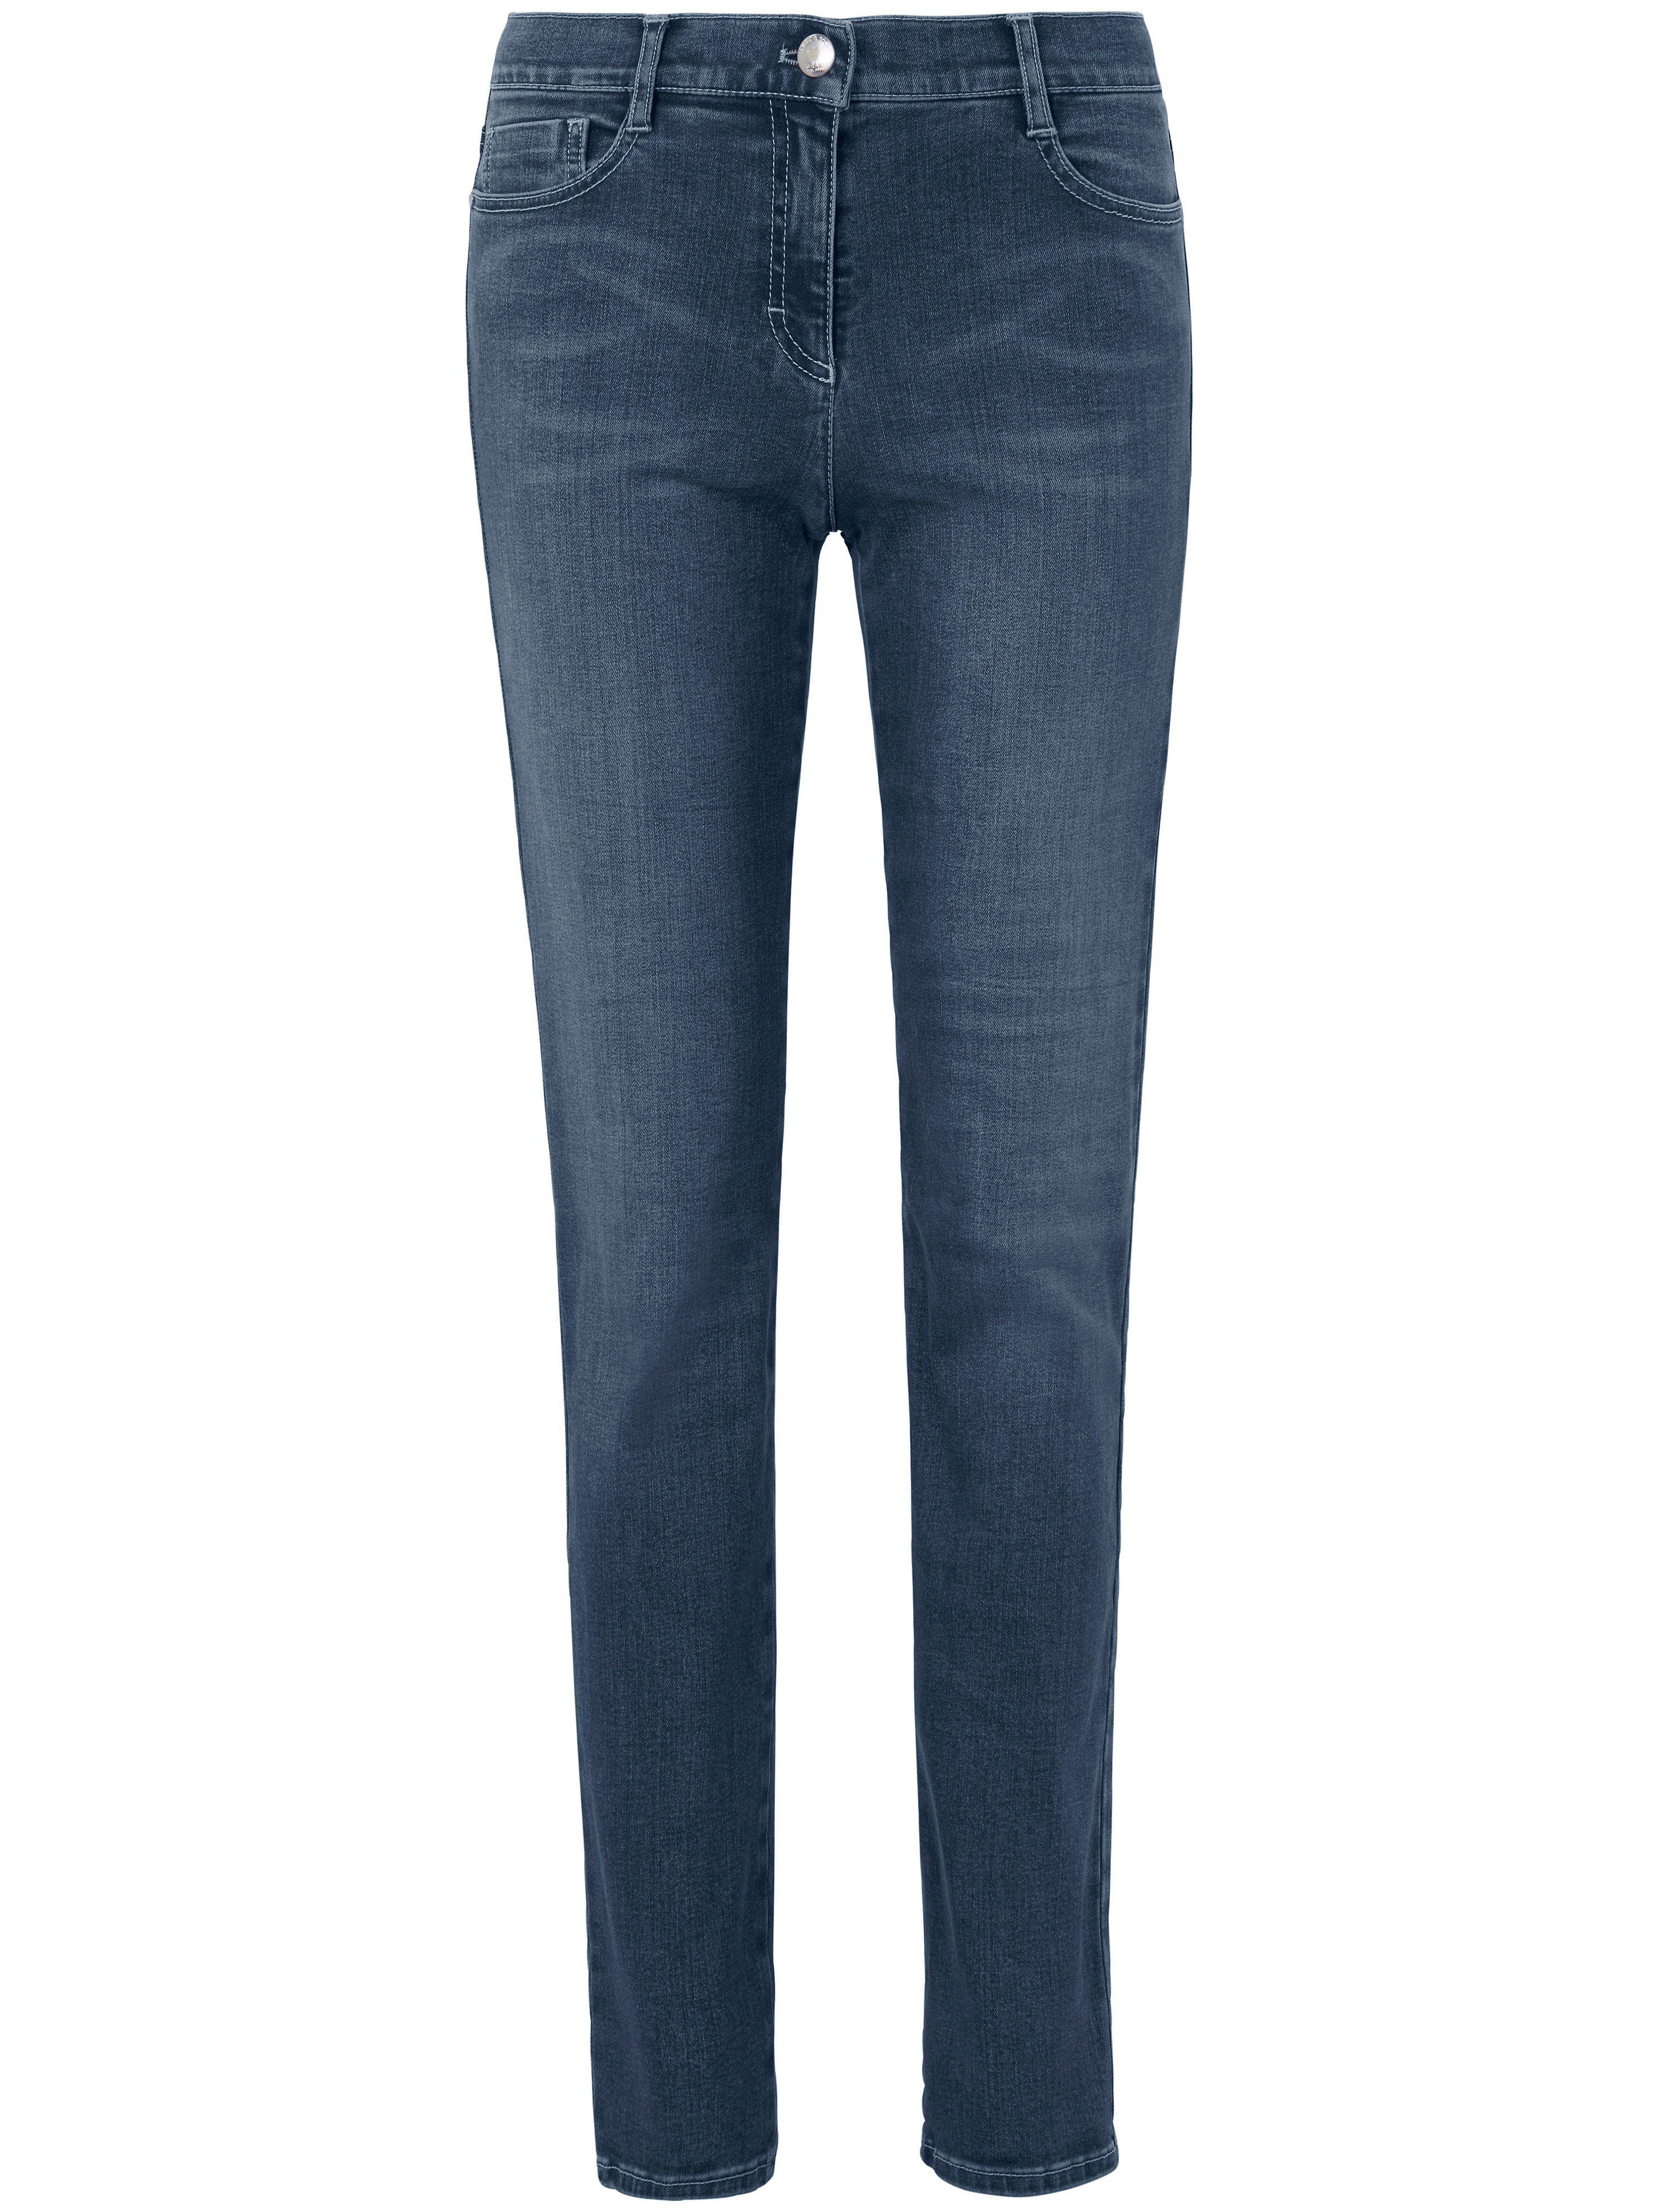 c1a8f8d29134d Le jean Slim Fit modèle Shakira Brax Feel Good denim taille 21 ...